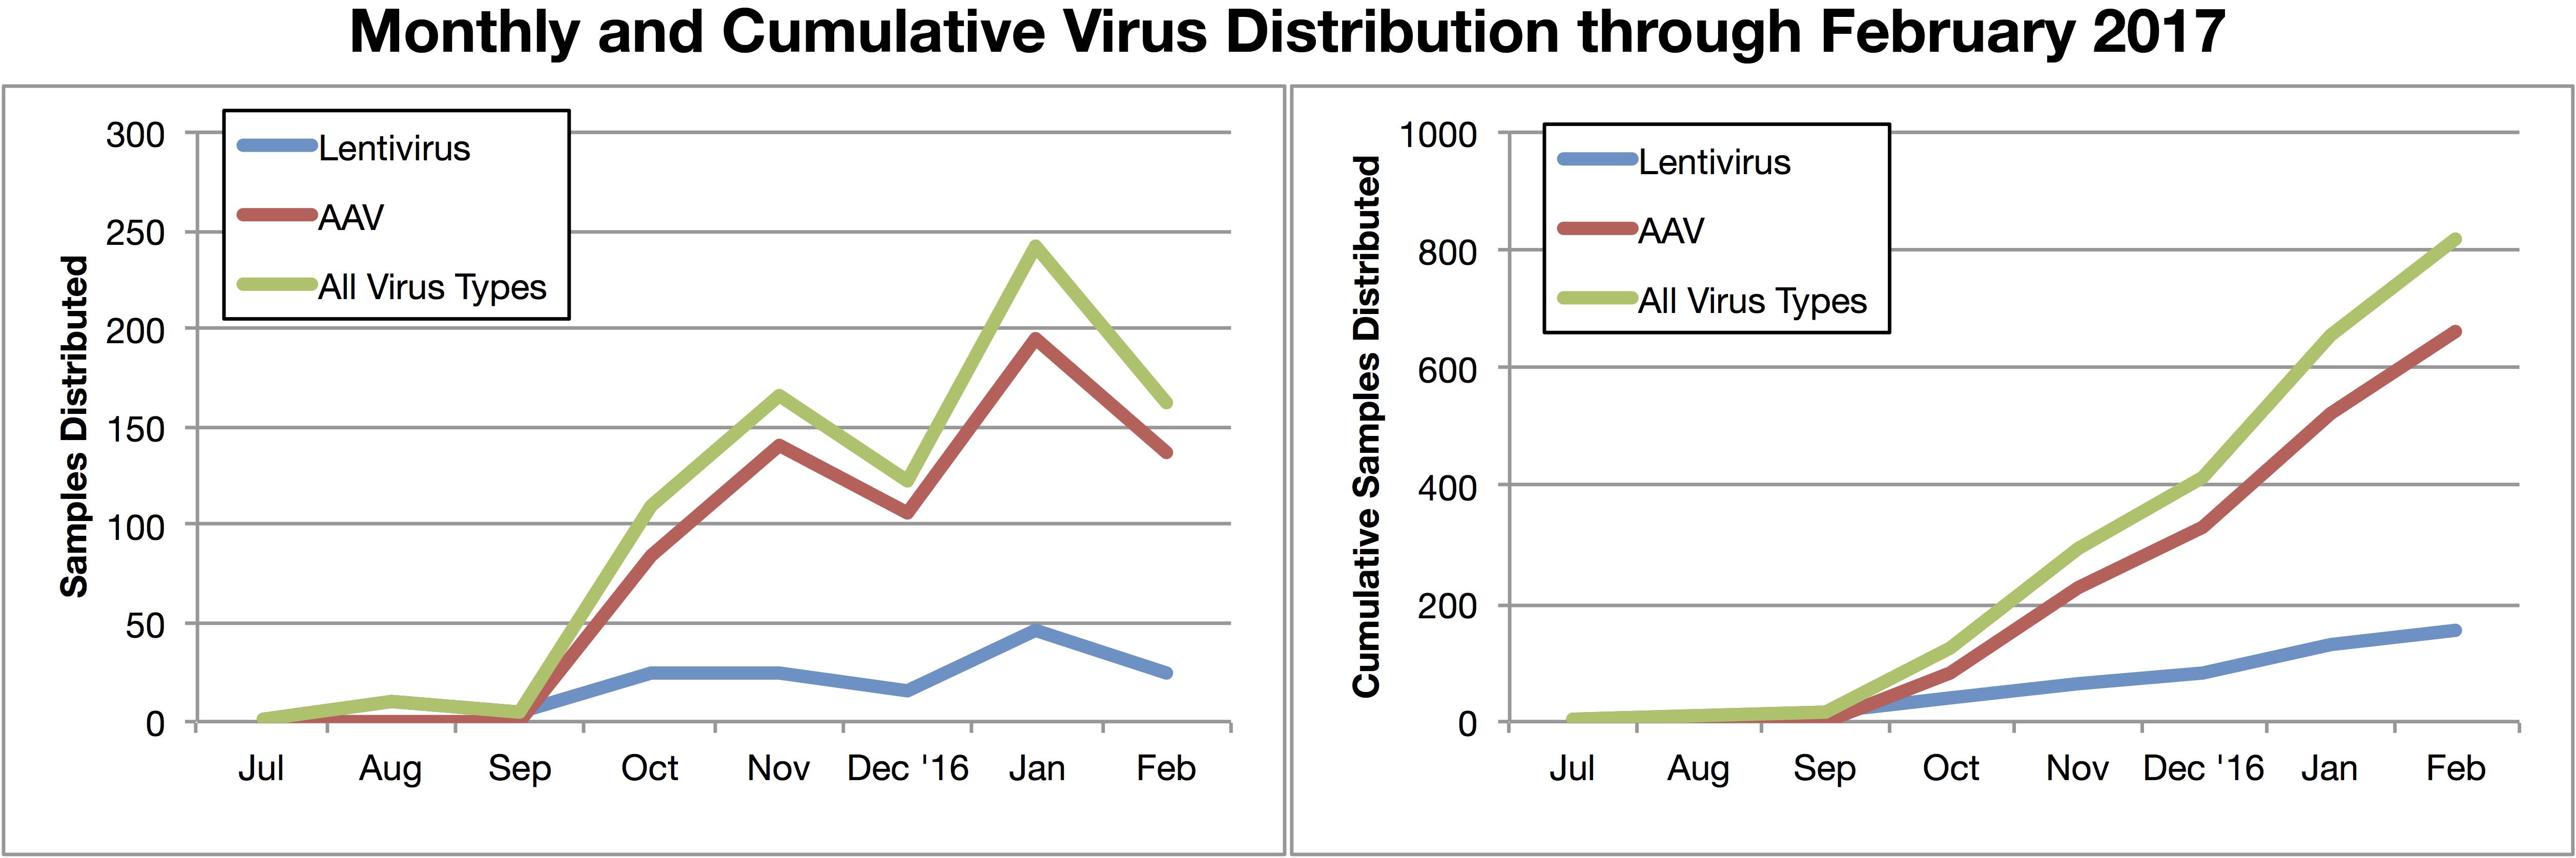 Monthly and Cummulative Virus Distribution